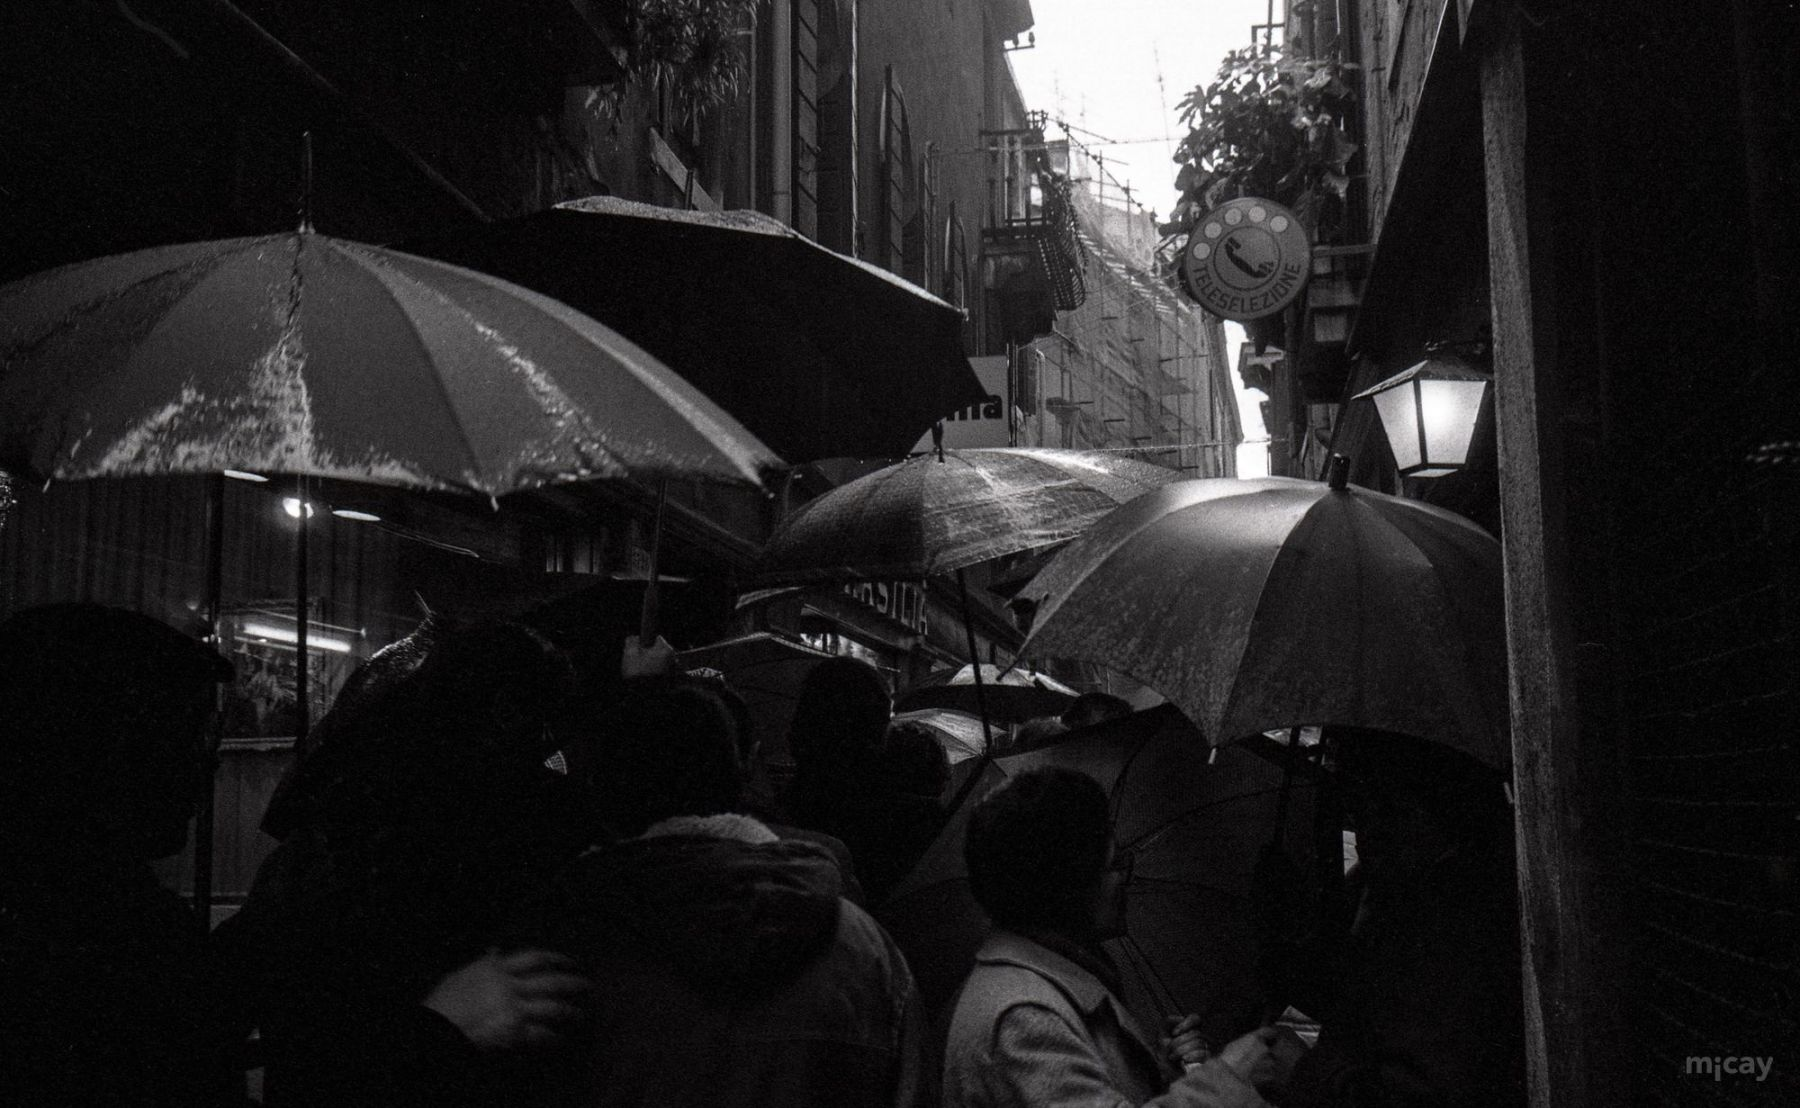 MichelAycaguer-Venise-AquaAlta-Noel-1981-31